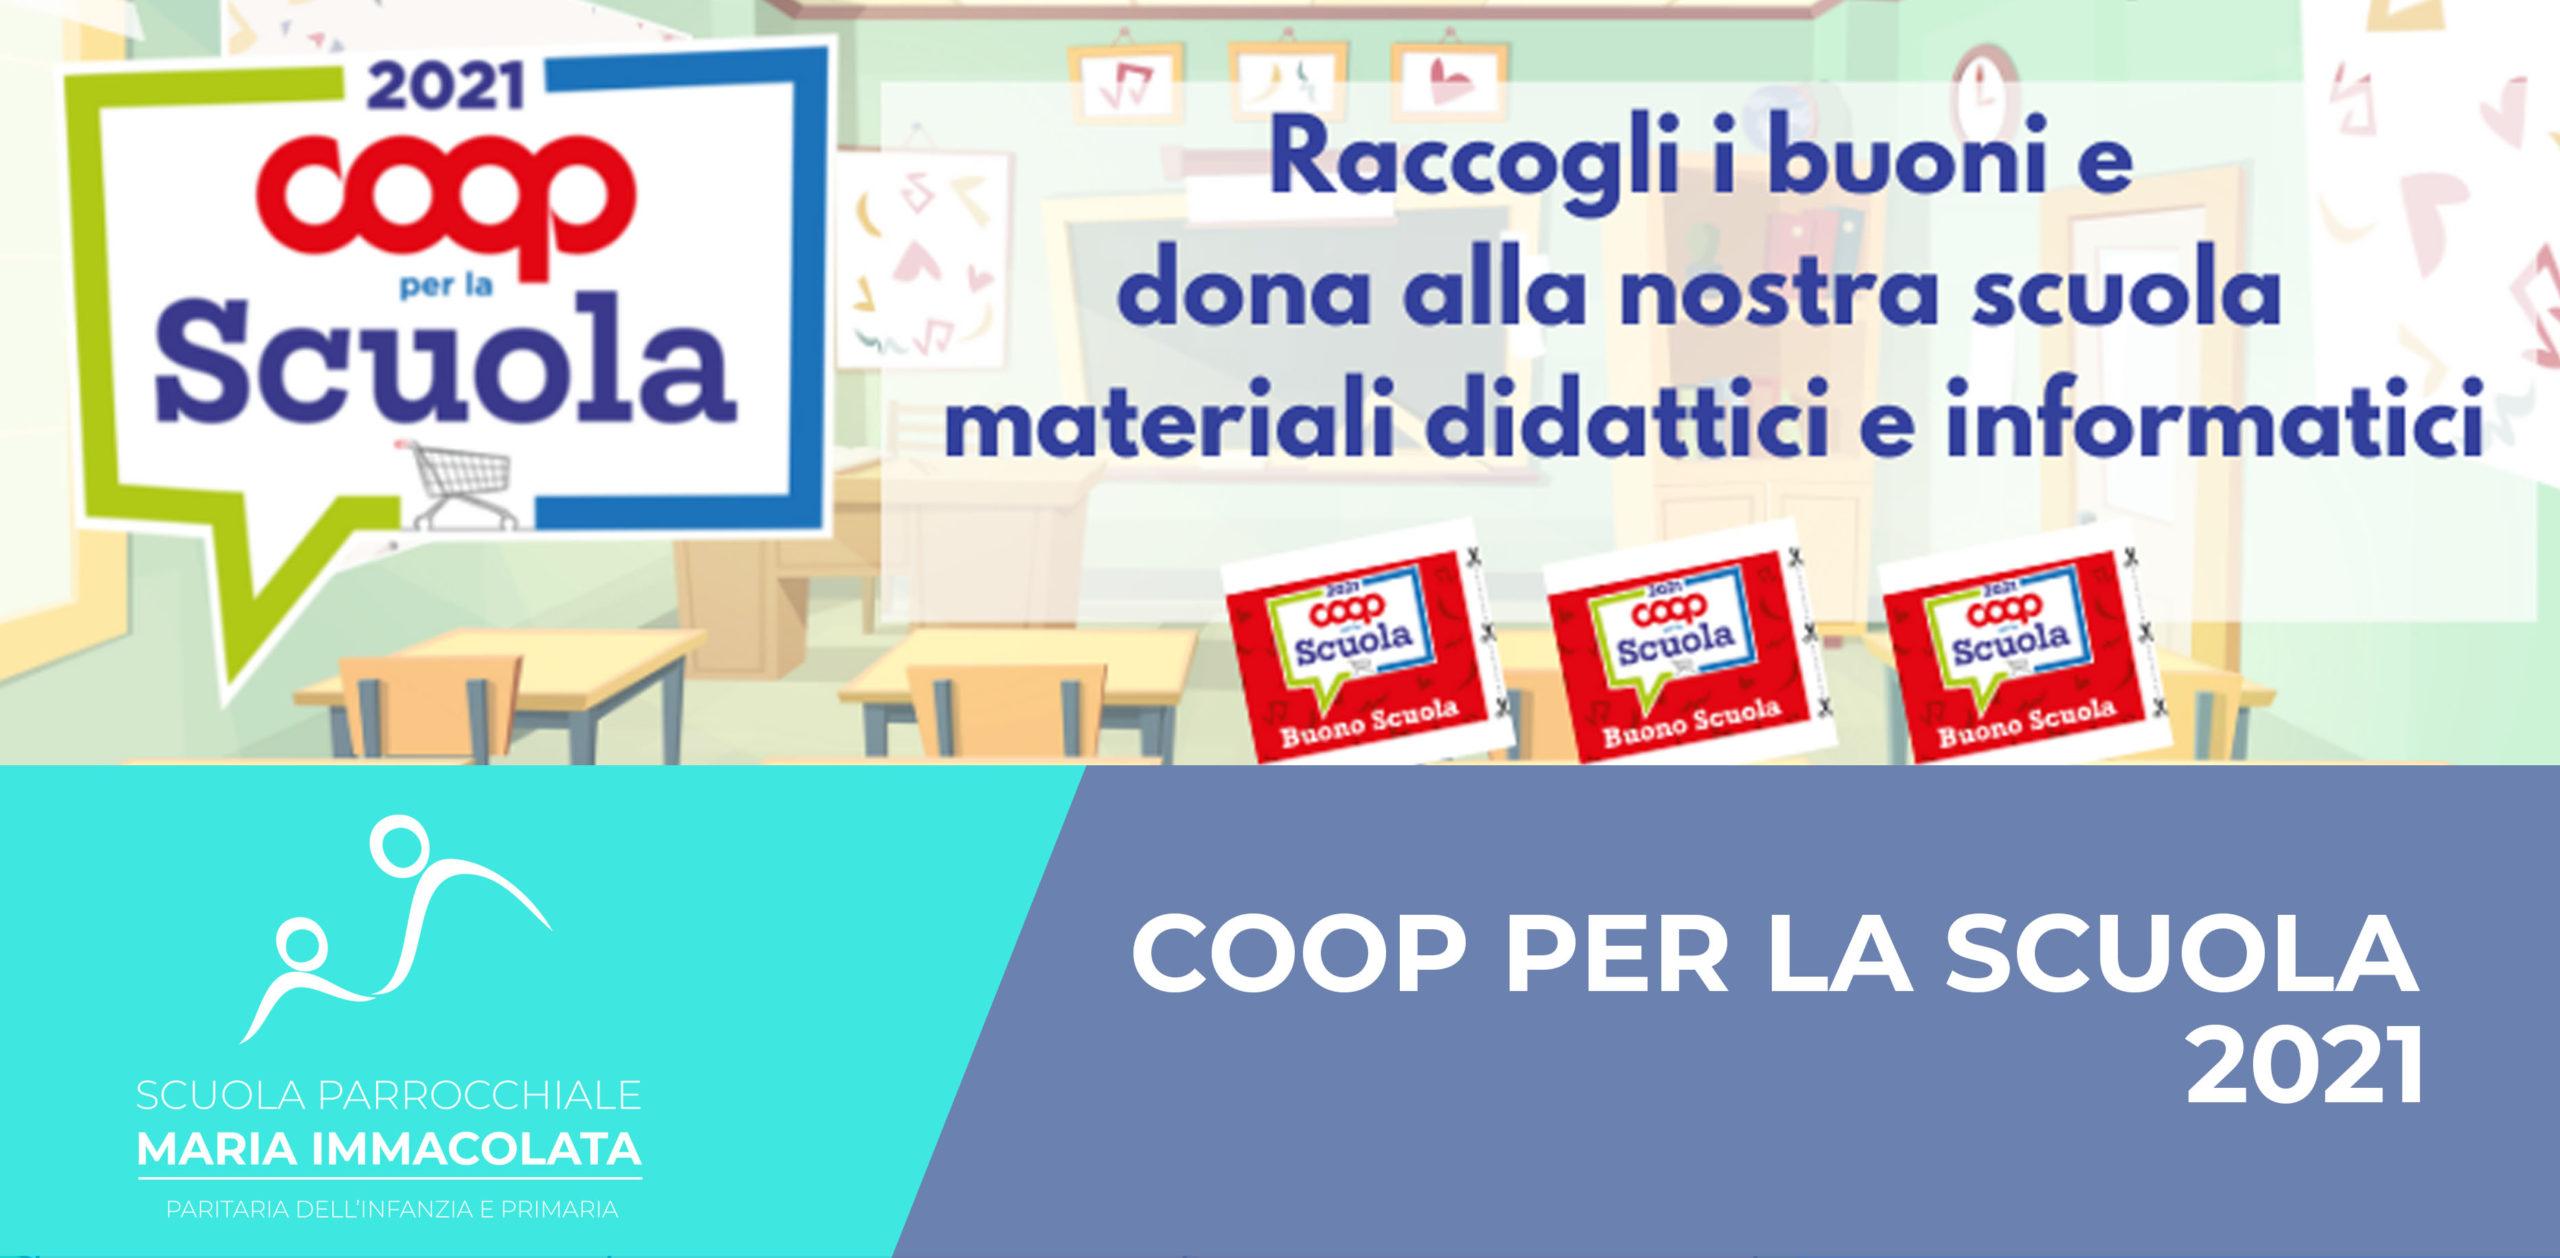 Iniziativa Coop per la Scuola 2021